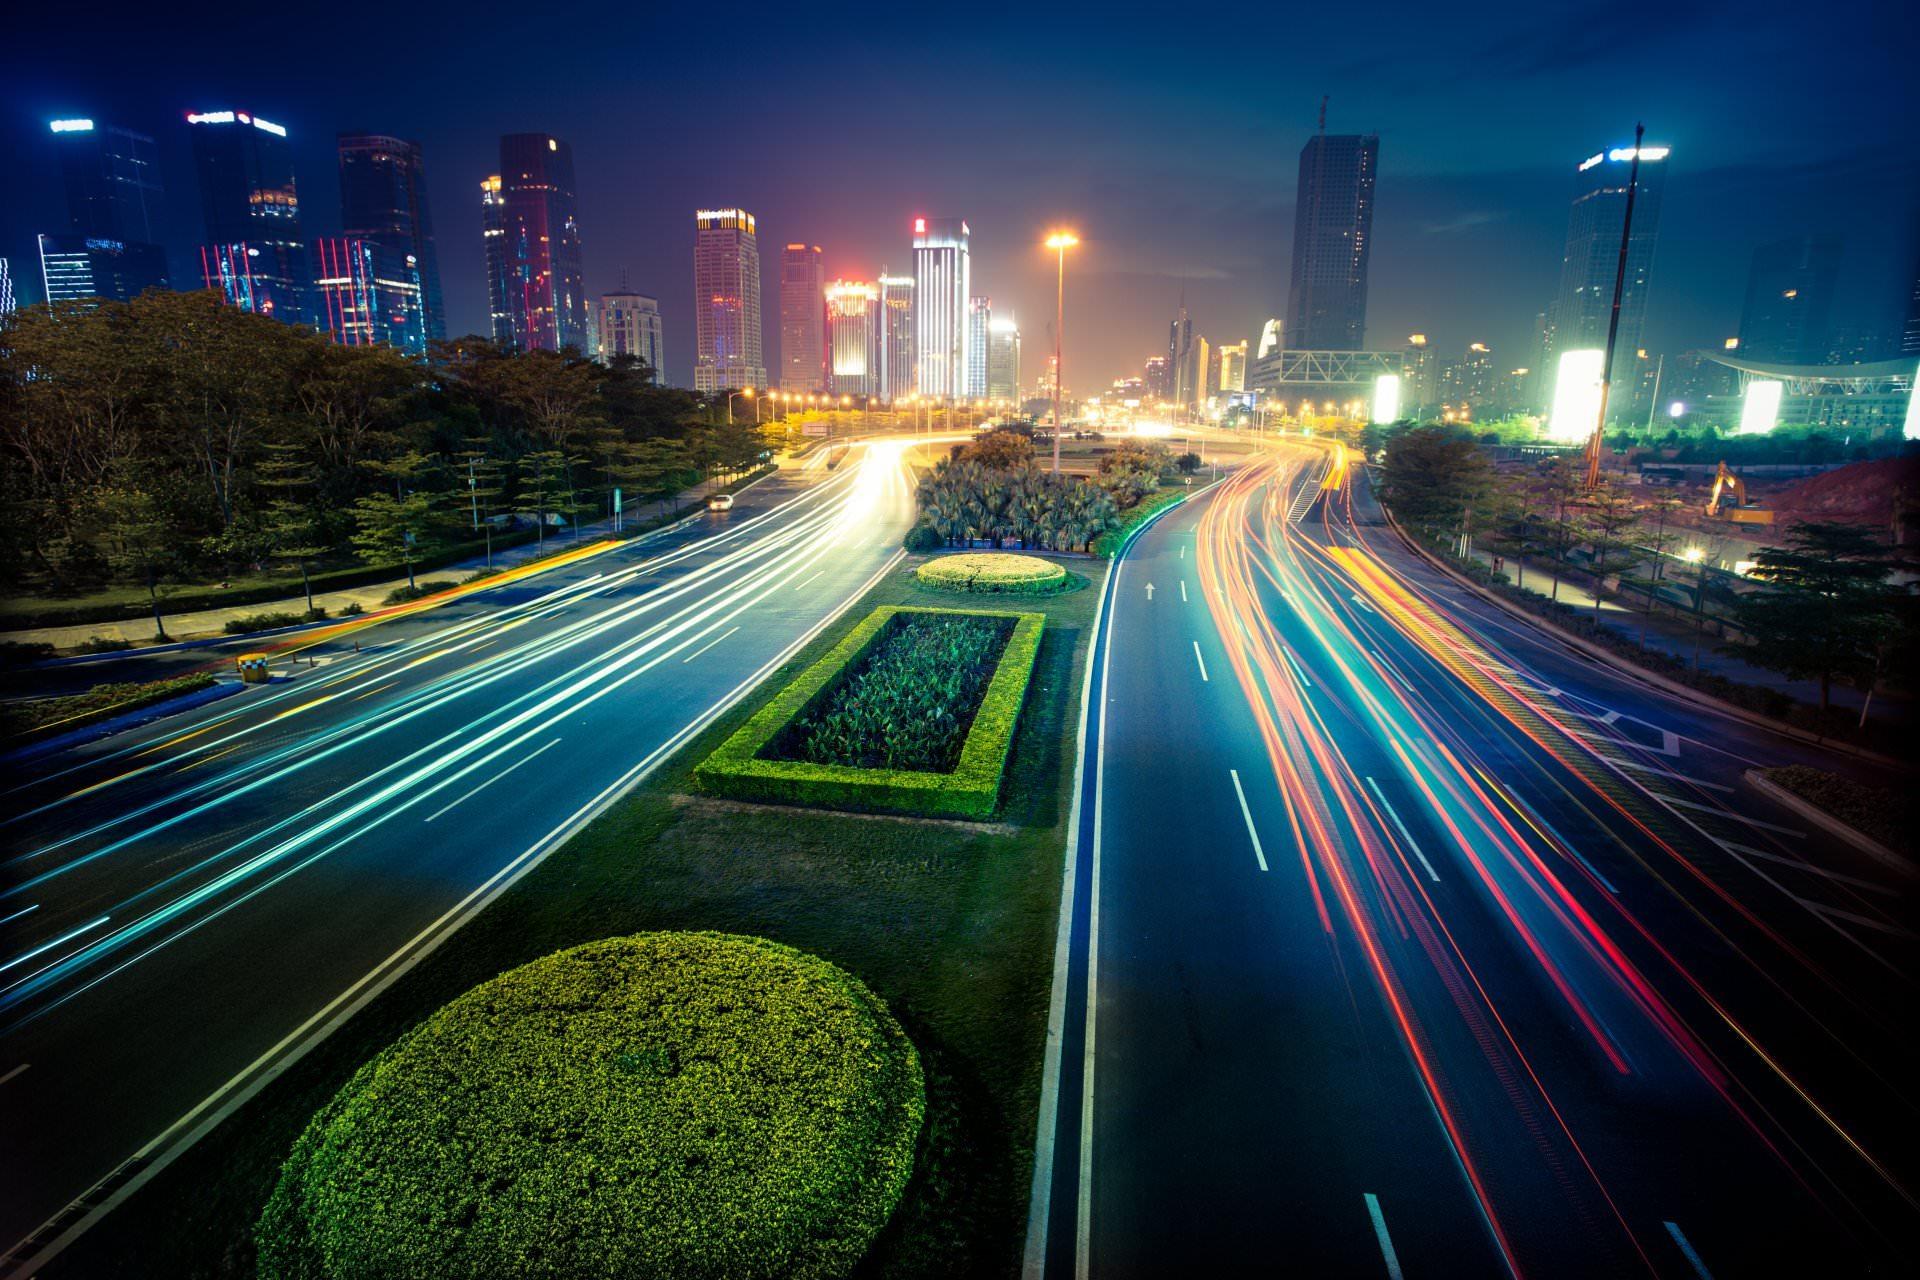 city-lights-street-buildings-blur-trees-town-lights-street-houses-blur-tree